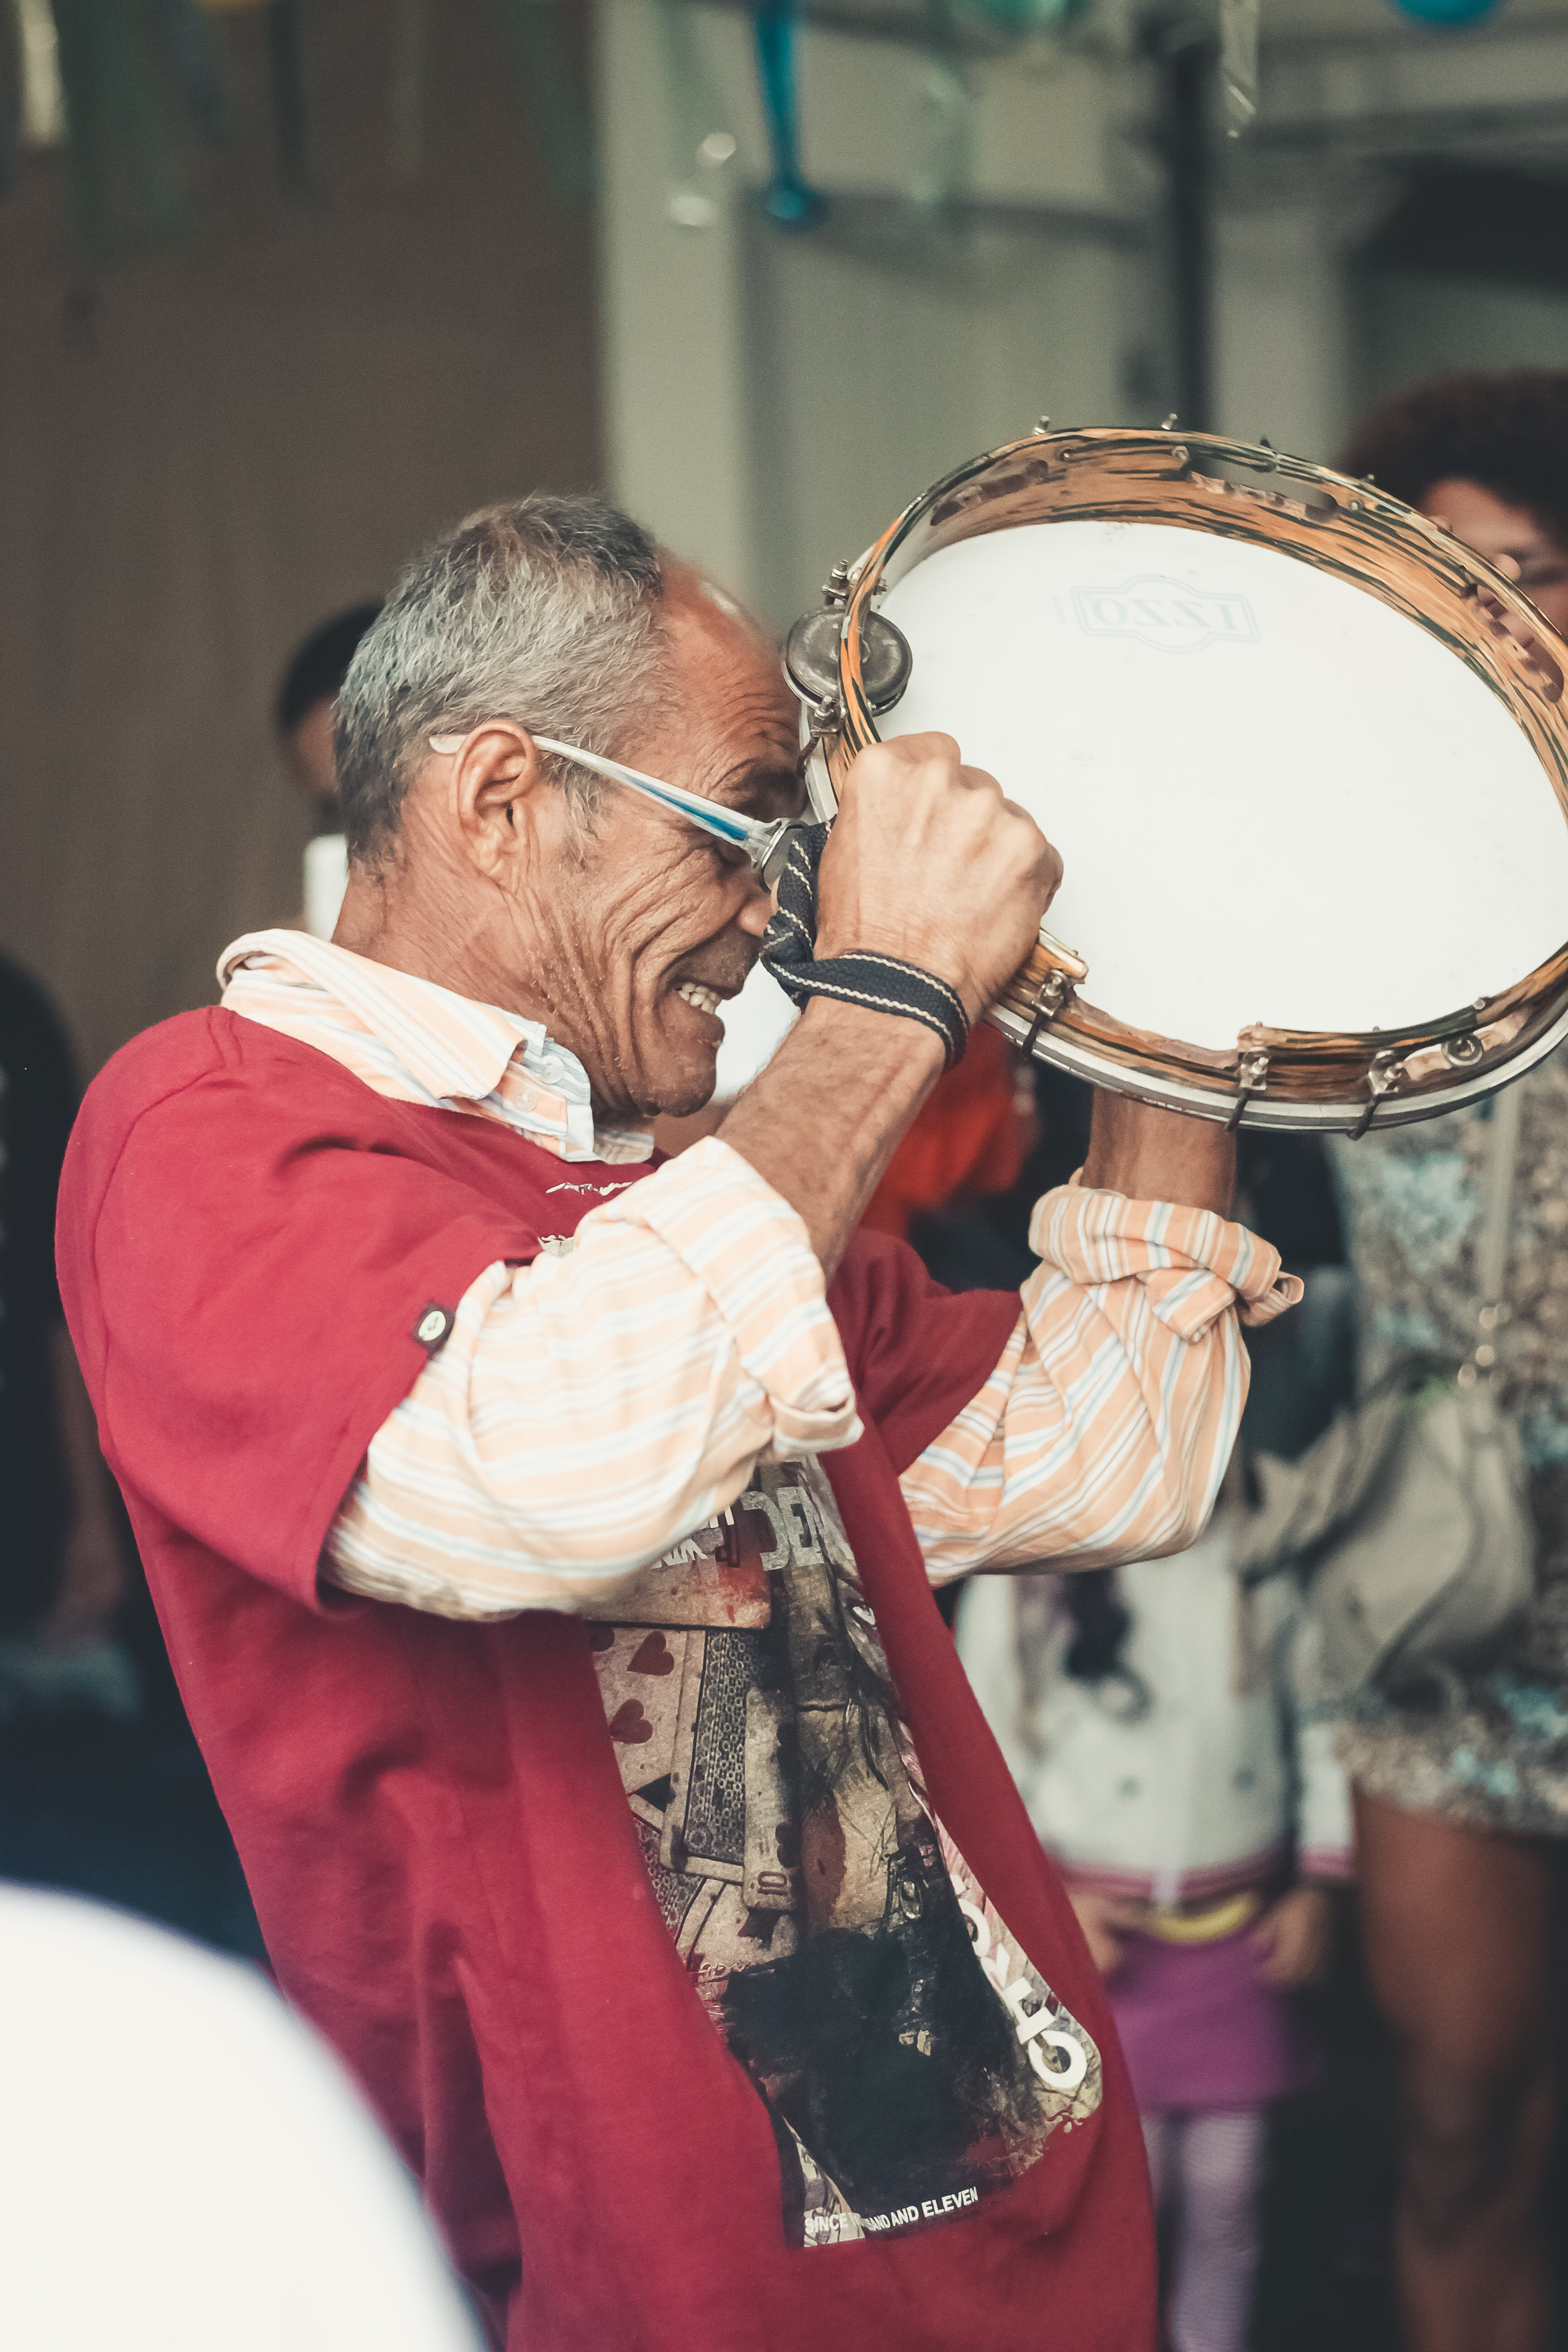 Gratis arkivbilde med fremføring, instrument, mann, musiker